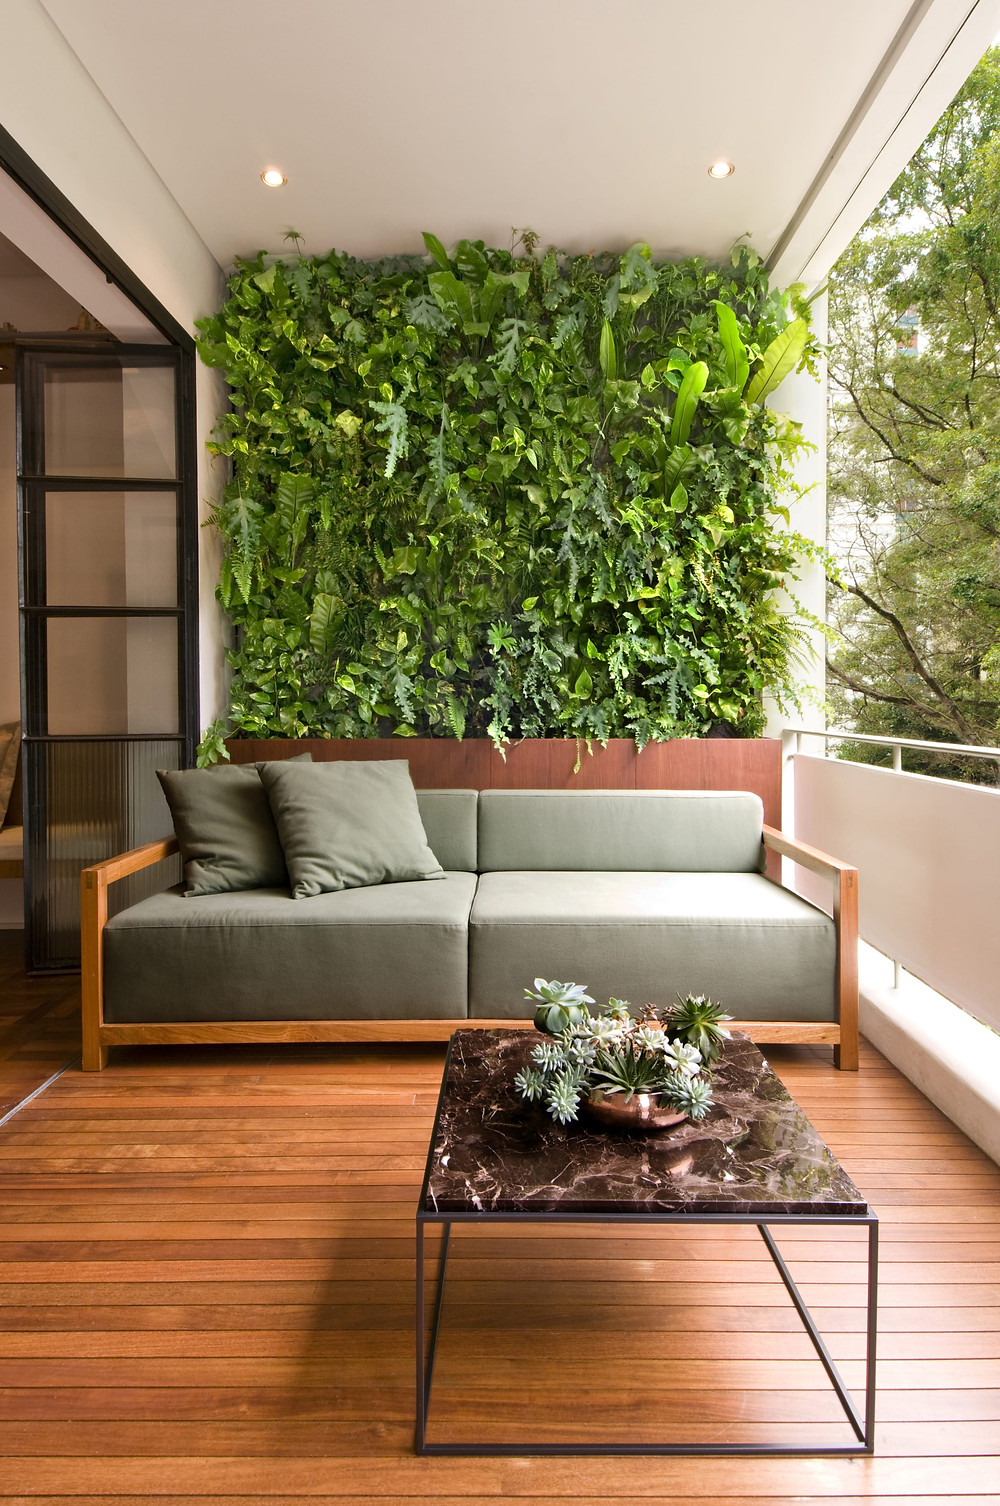 Jardim Vertical em Apartamento - Vertical Garden